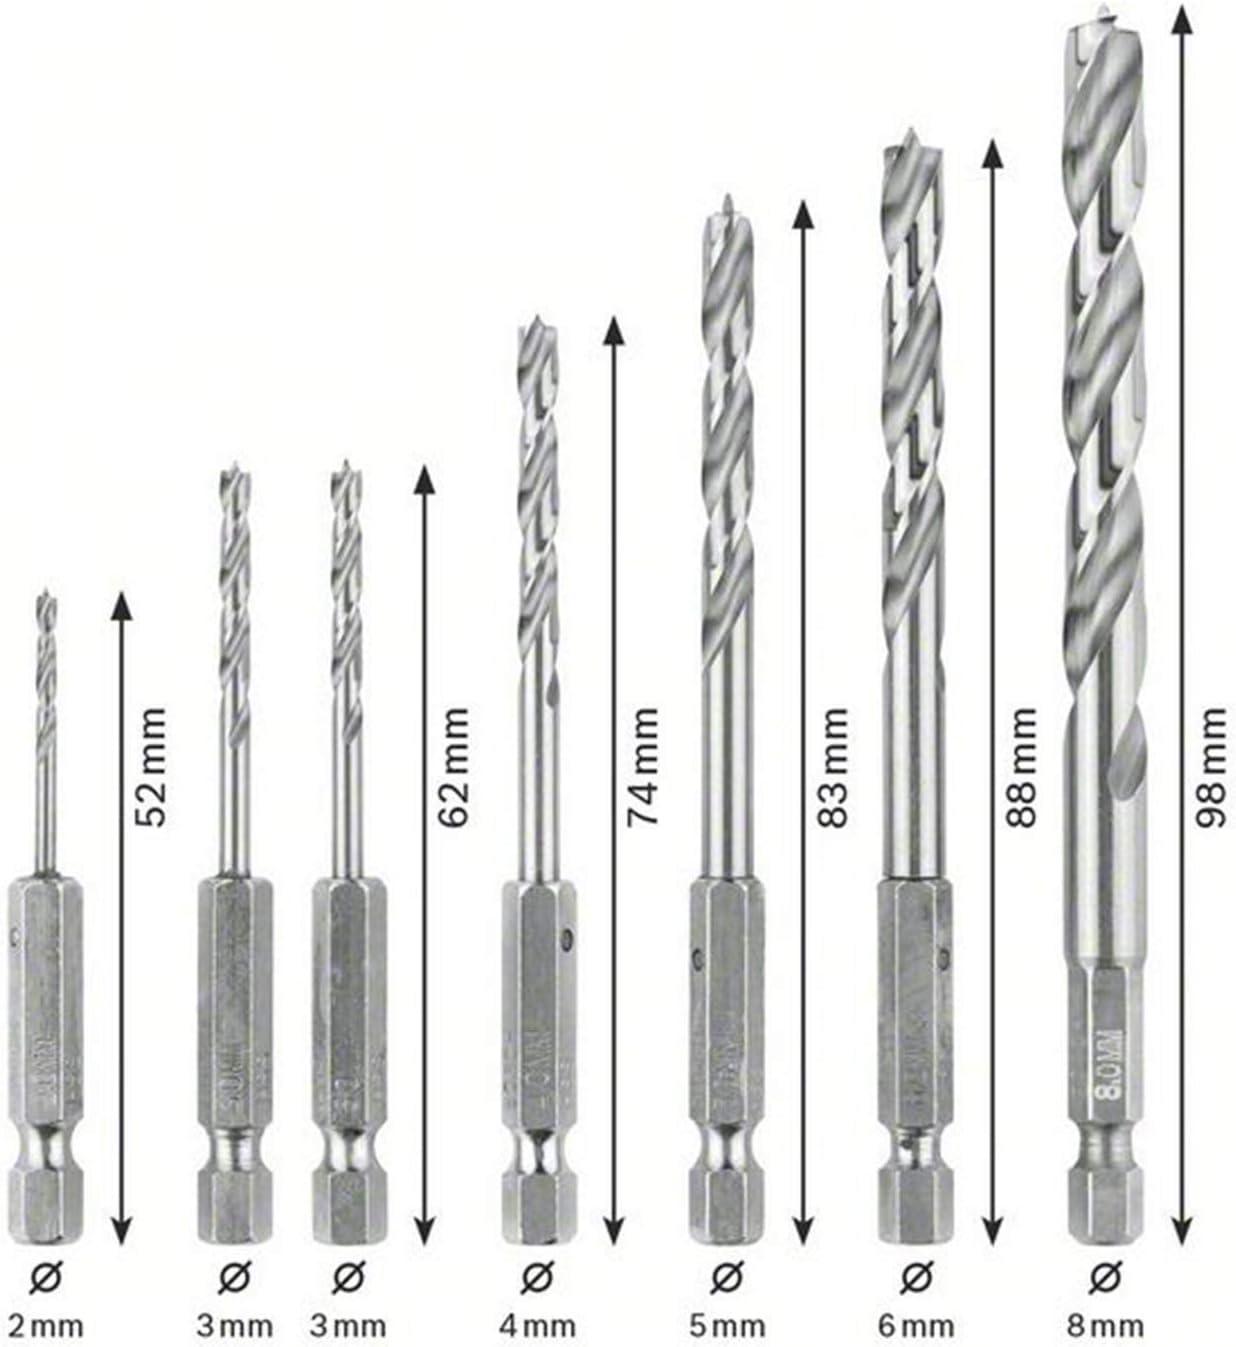 pack de 7 Bosch 2 607 019 923 2; 3; 3; 4; 5; 6; 8 mm Set de 7 brocas para madera Robust Line v/ástago hexagonal